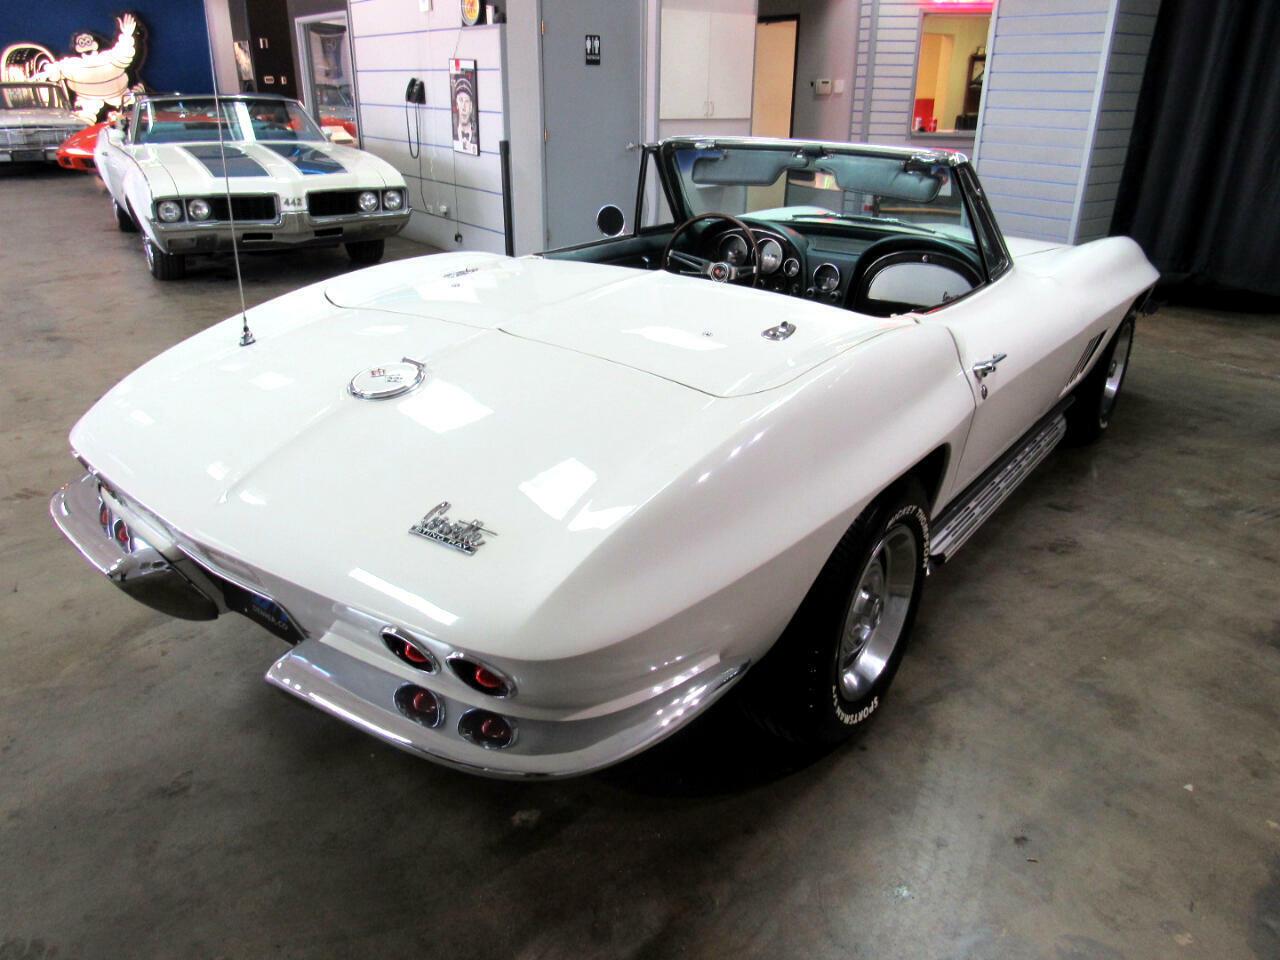 1967 White Chevrolet Corvette Convertible  | C2 Corvette Photo 5